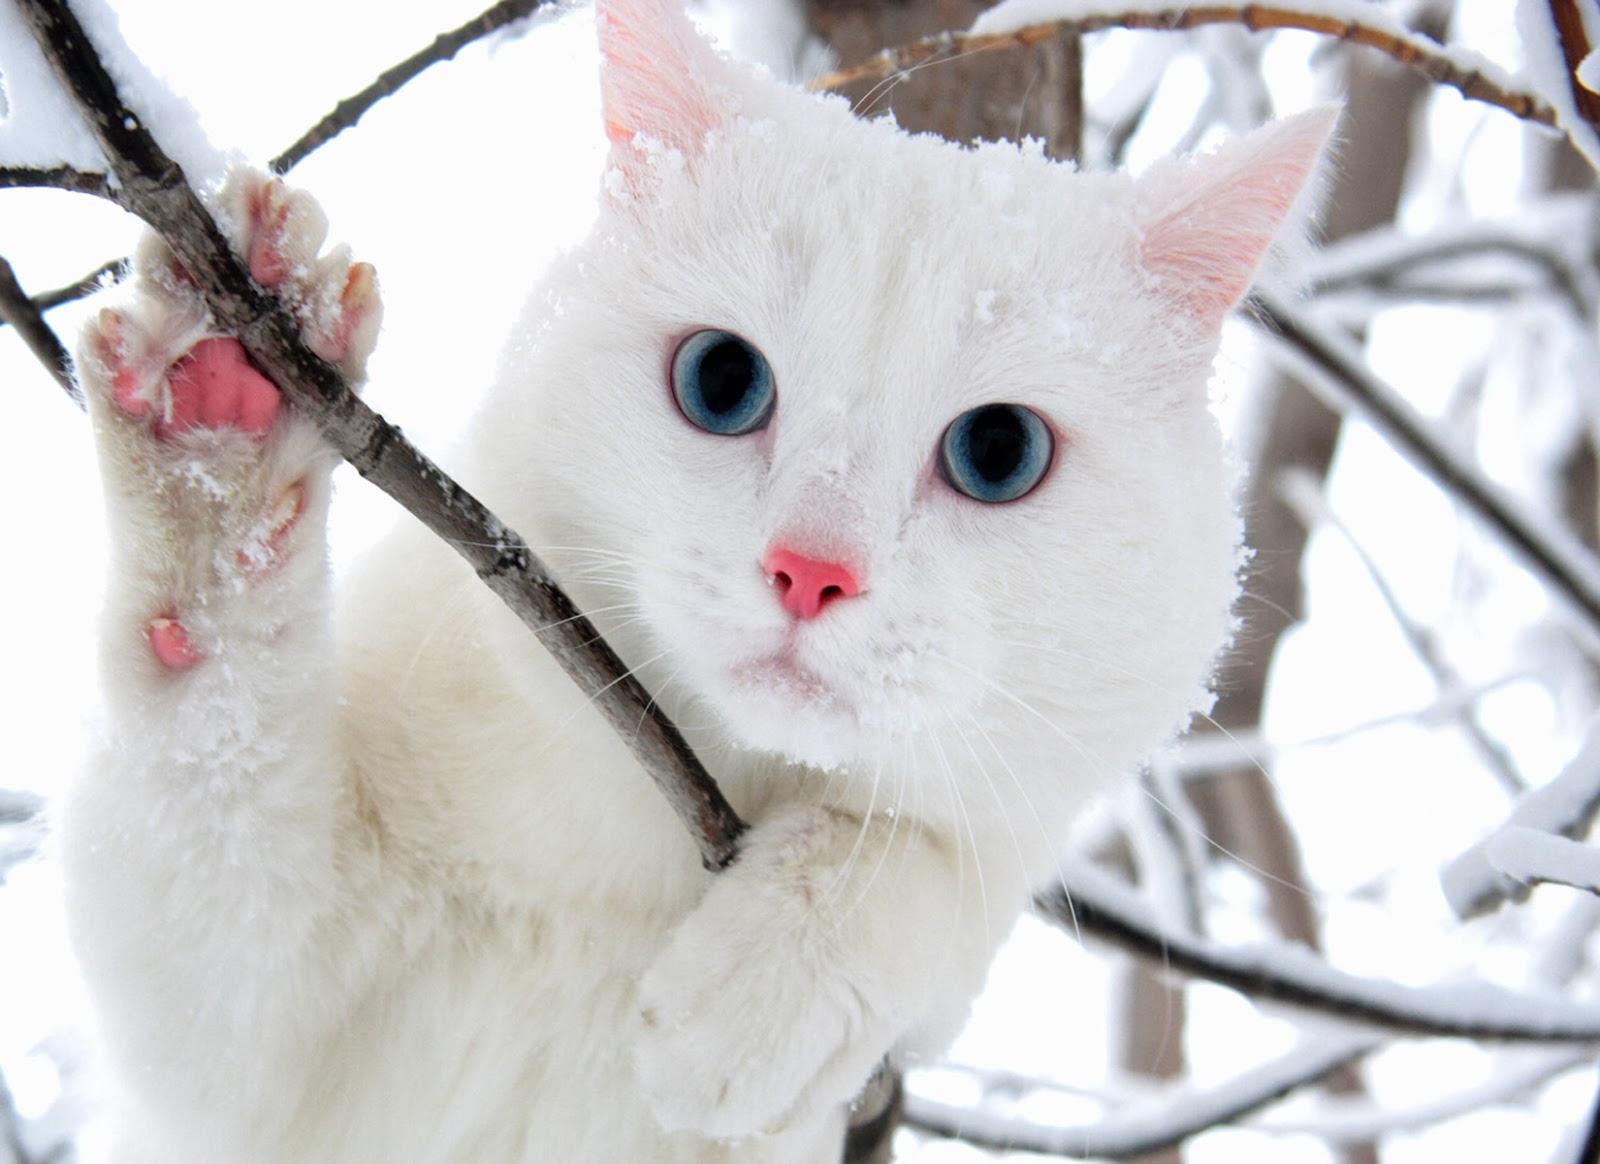 White Cat Wallpaper   beautiful desktop wallpapers 2014 1600x1164